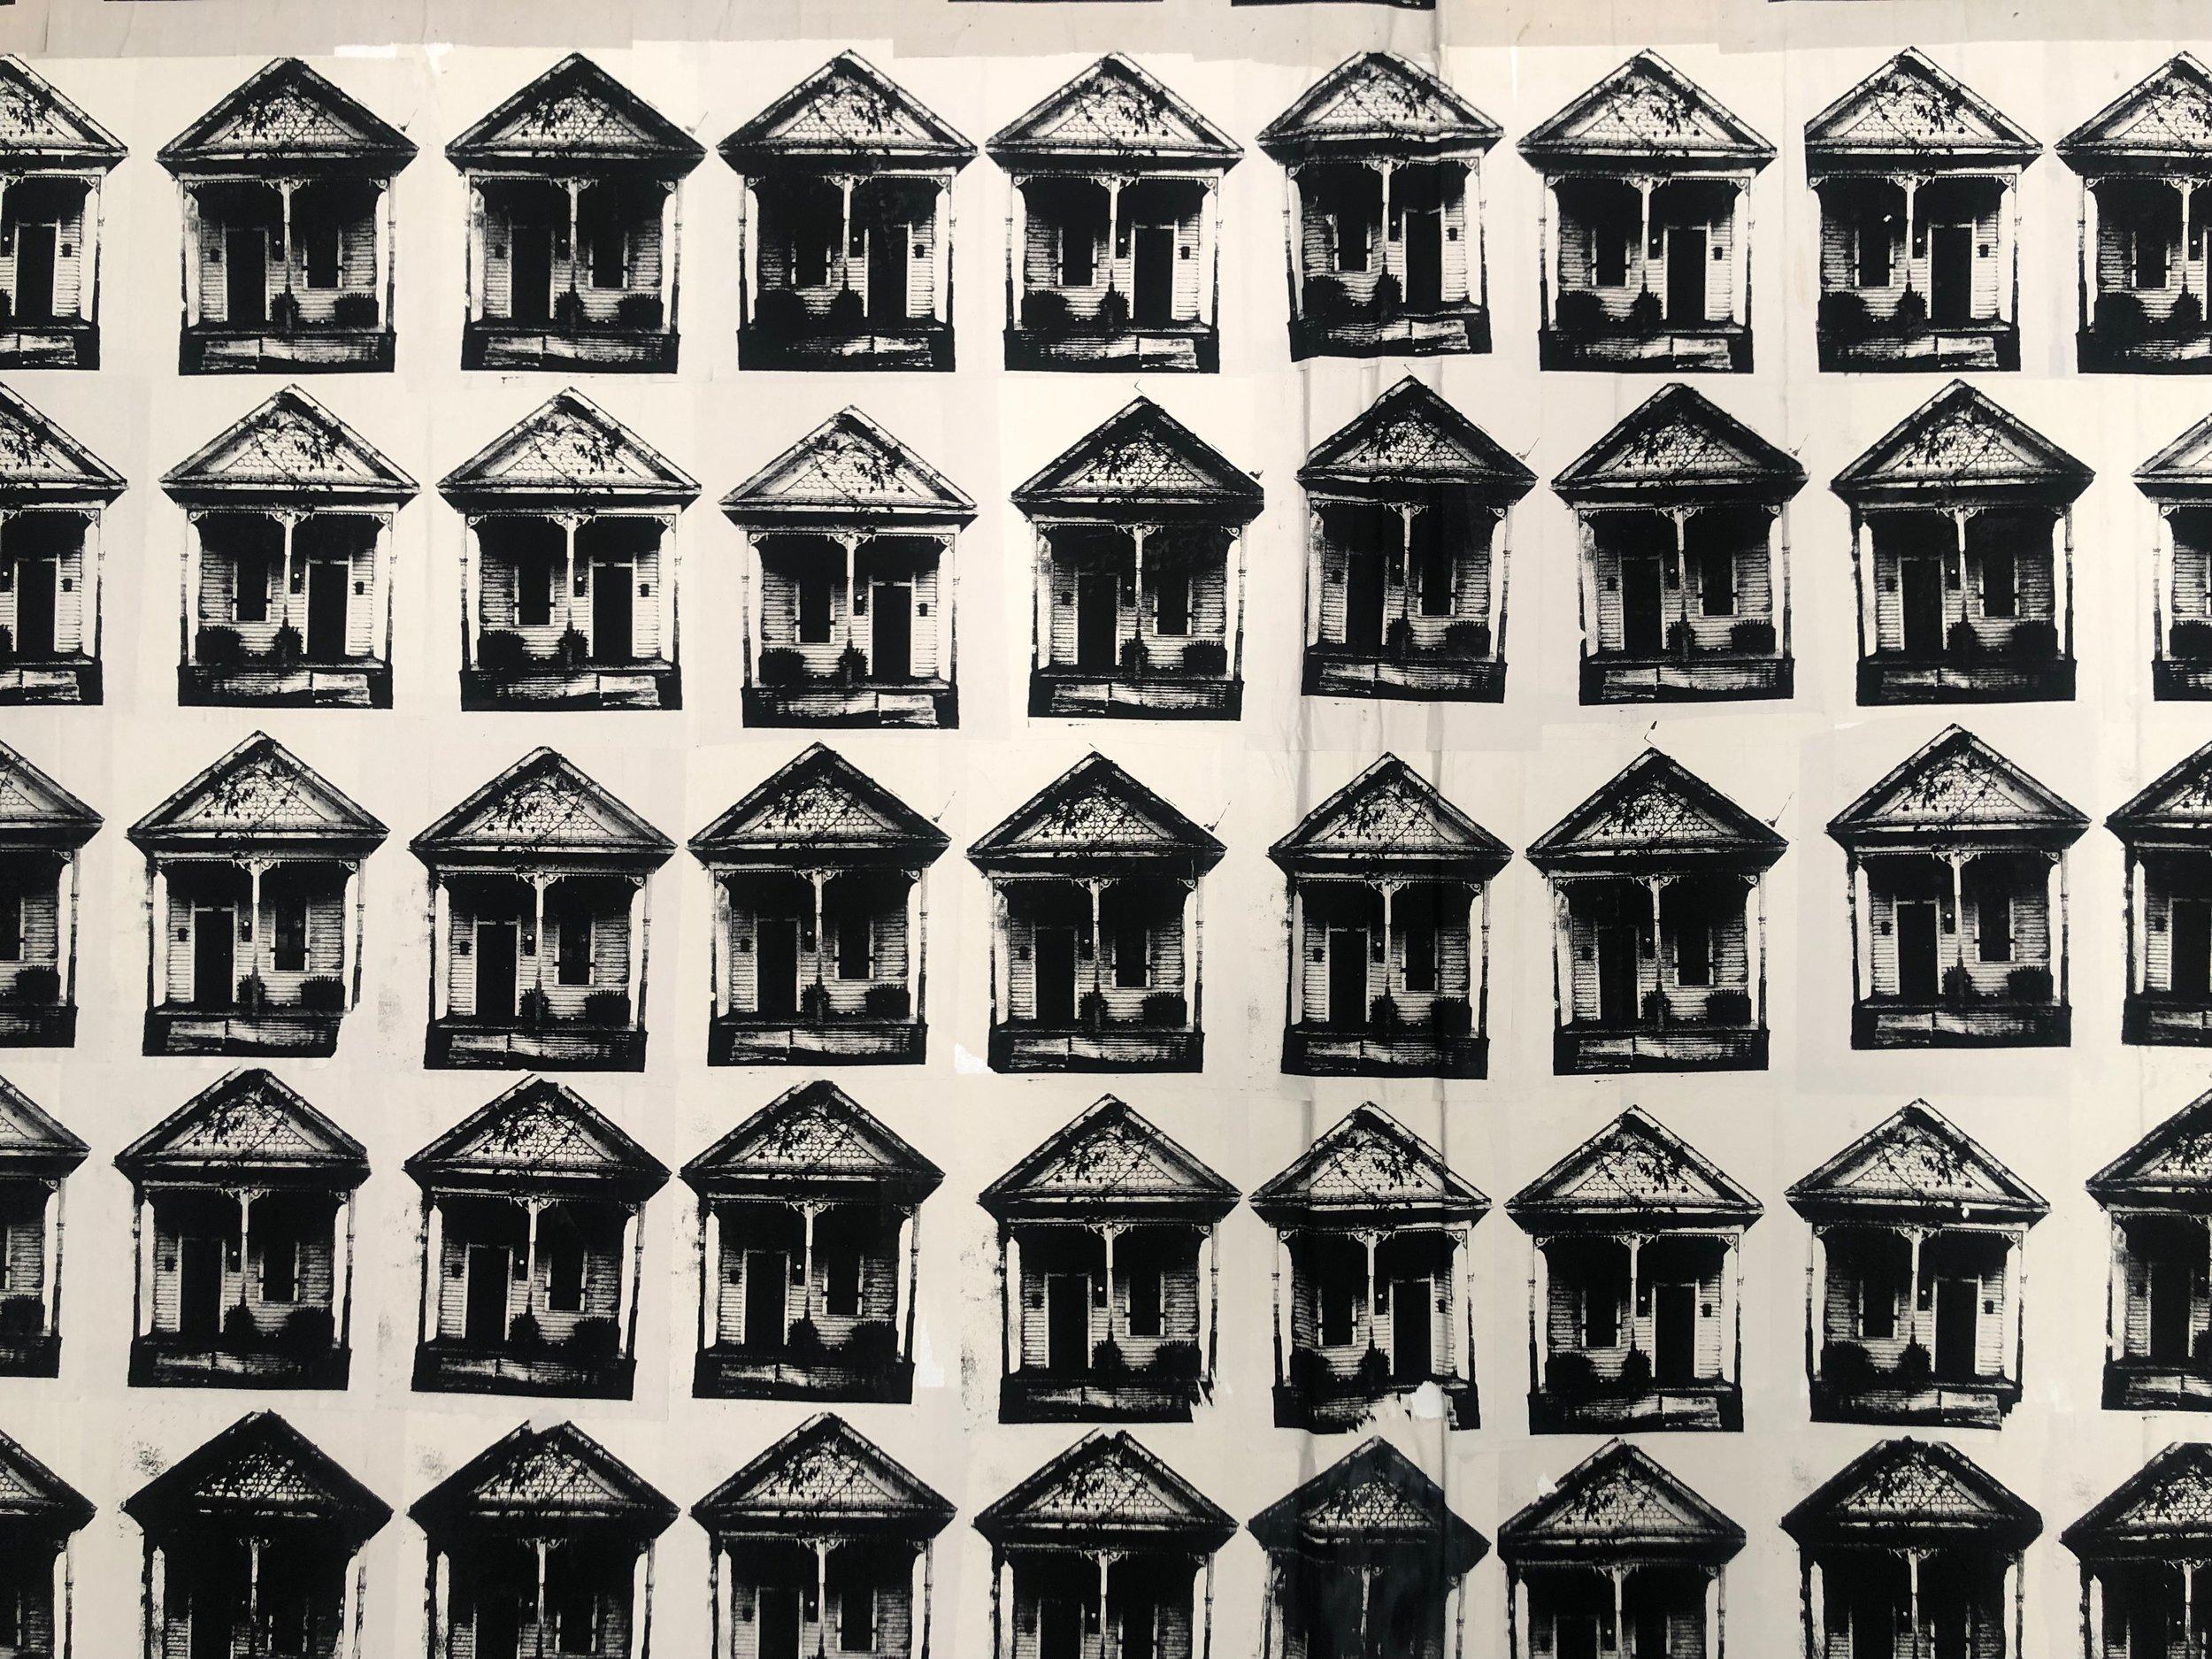 Katarina Guzman, Ten Thousand Shotgun Houses, 2019